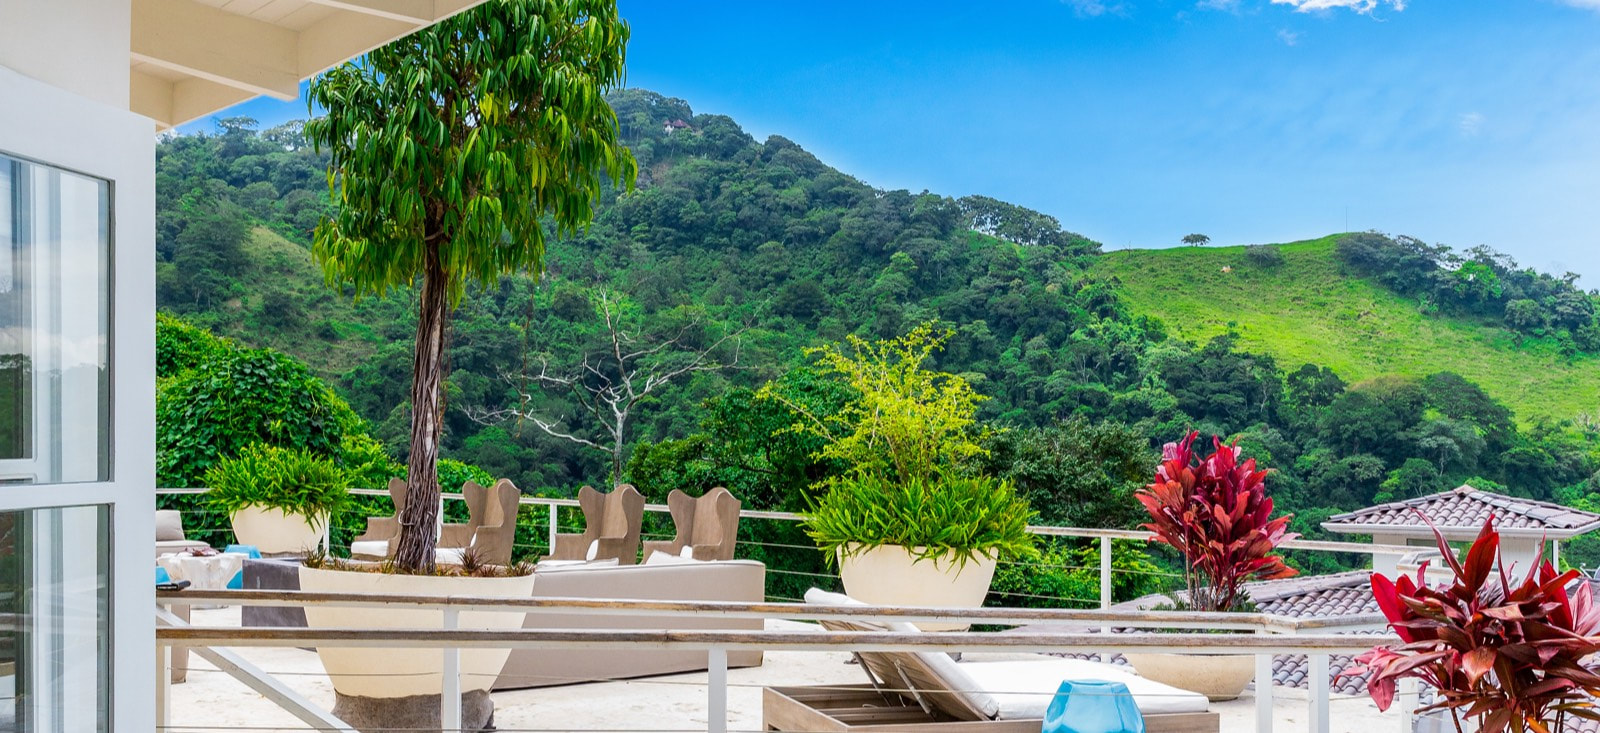 landcape-from-yoga-terrace_7_orig.jpg